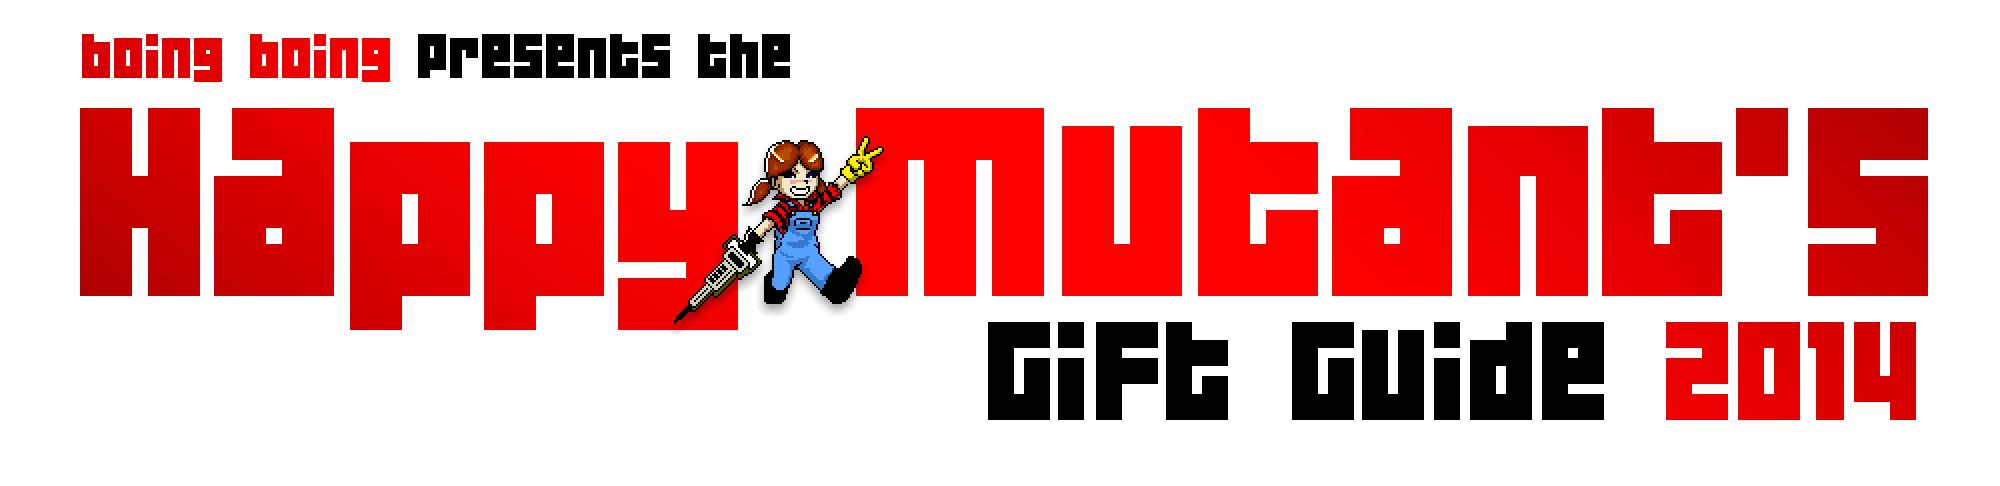 Last-minute gift ideas / Boing Boing